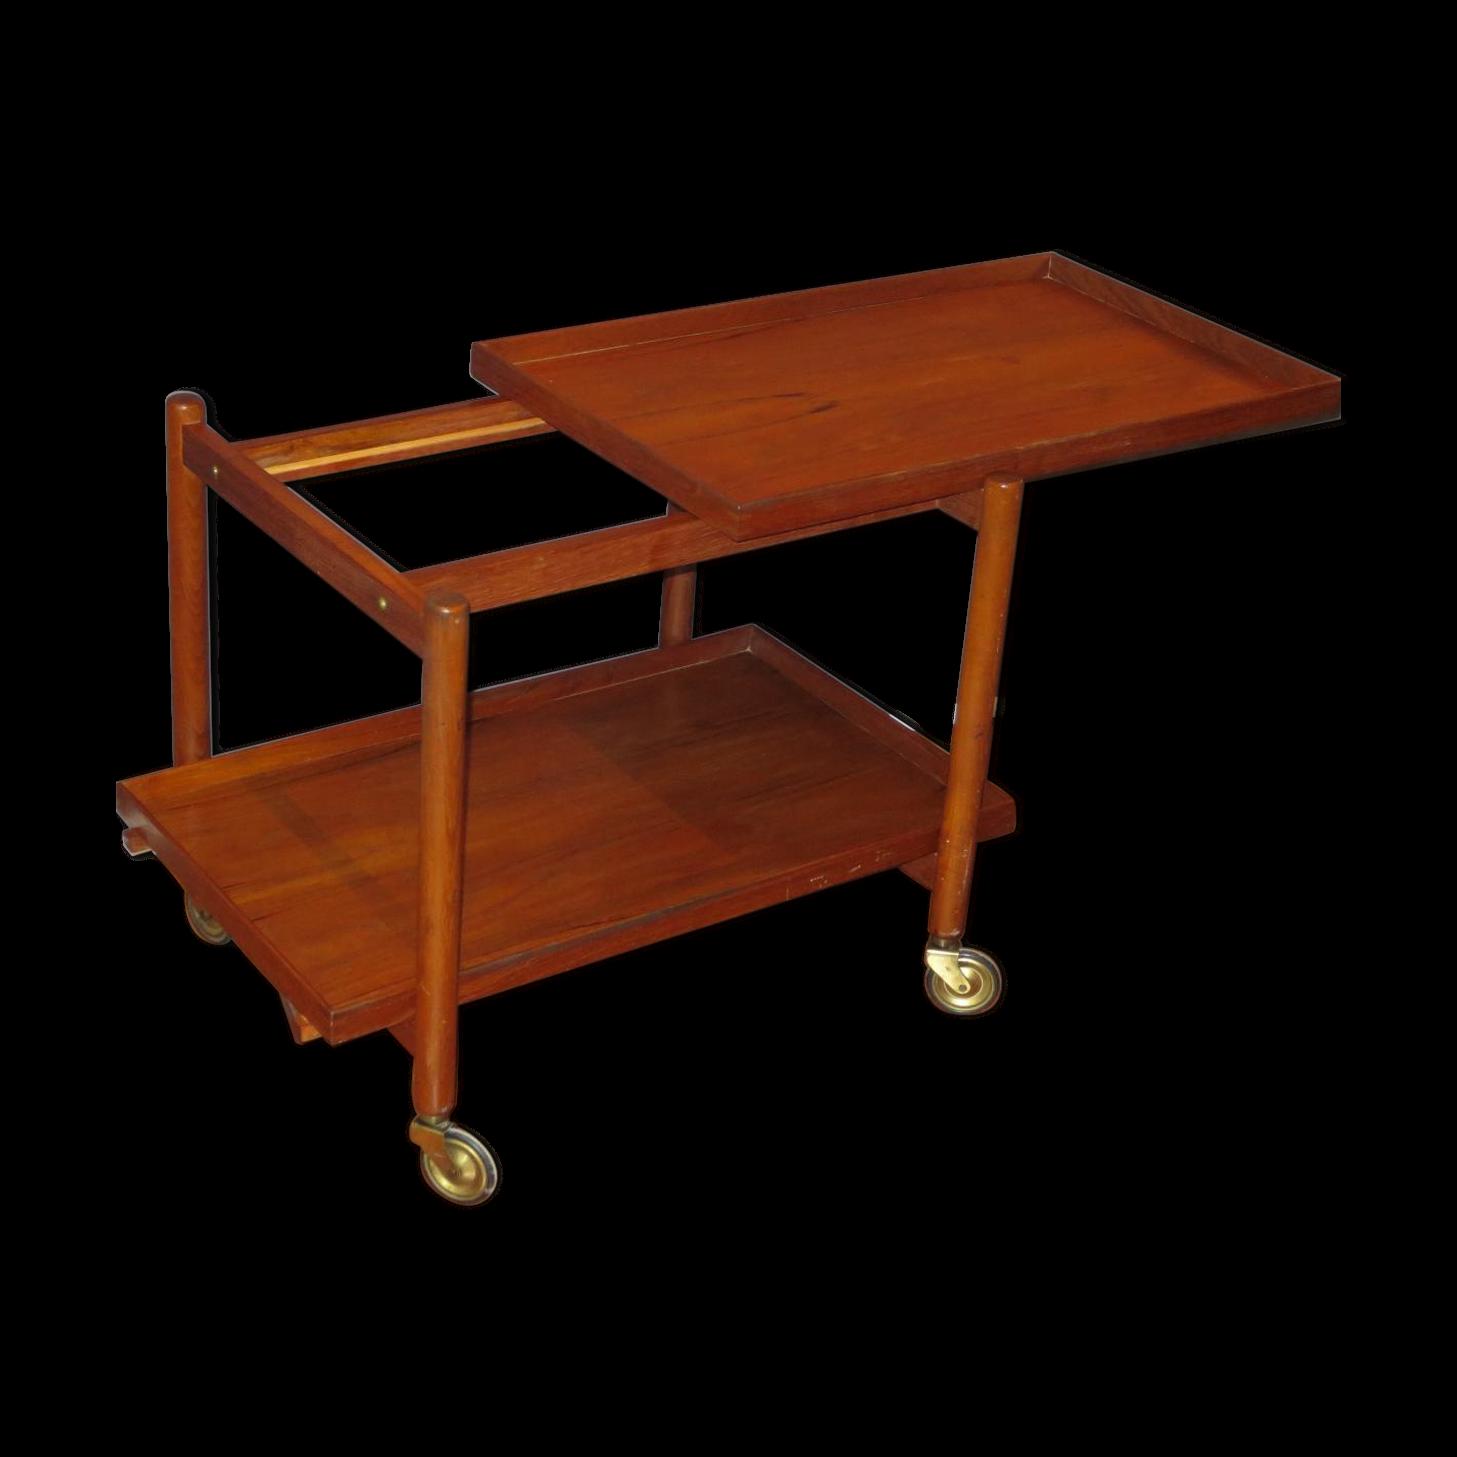 Table roulante pliable amazing table roulante pliante bhv - Table a langer roulante ...